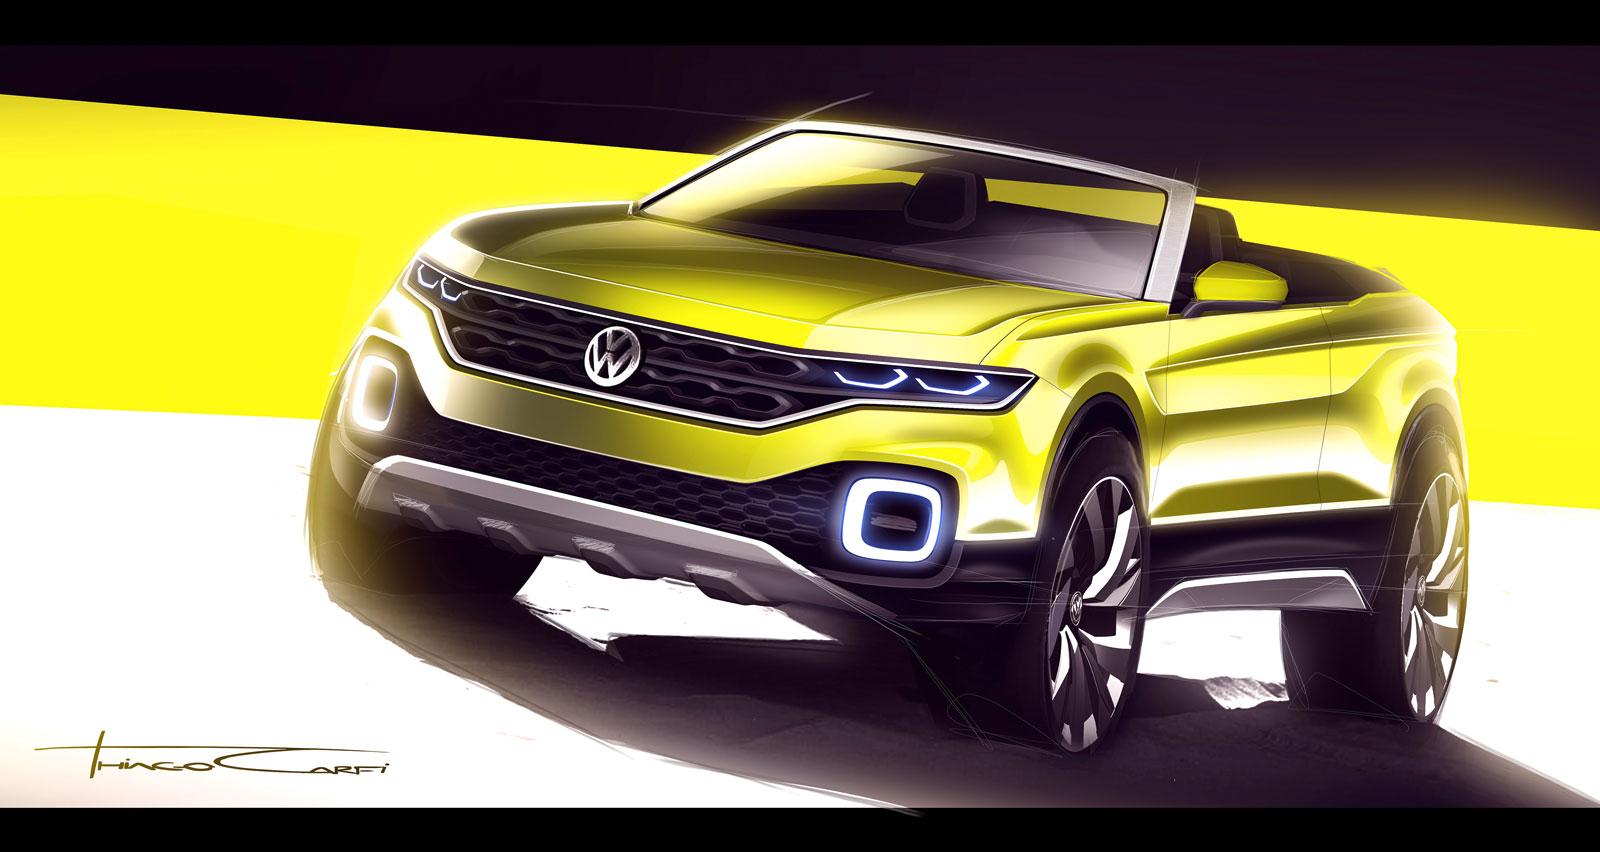 volkswagen t cross breeze concept car body design. Black Bedroom Furniture Sets. Home Design Ideas